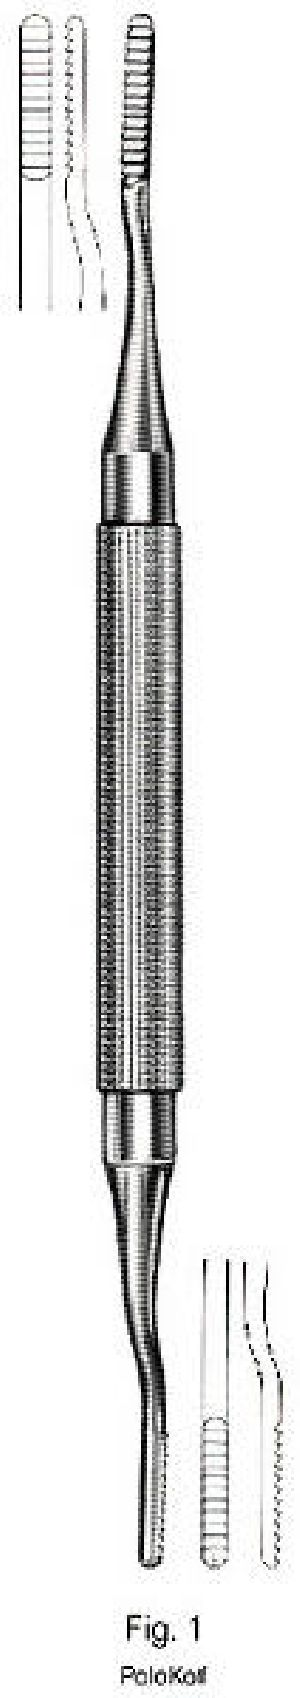 MI-55-101 Dental Bone File